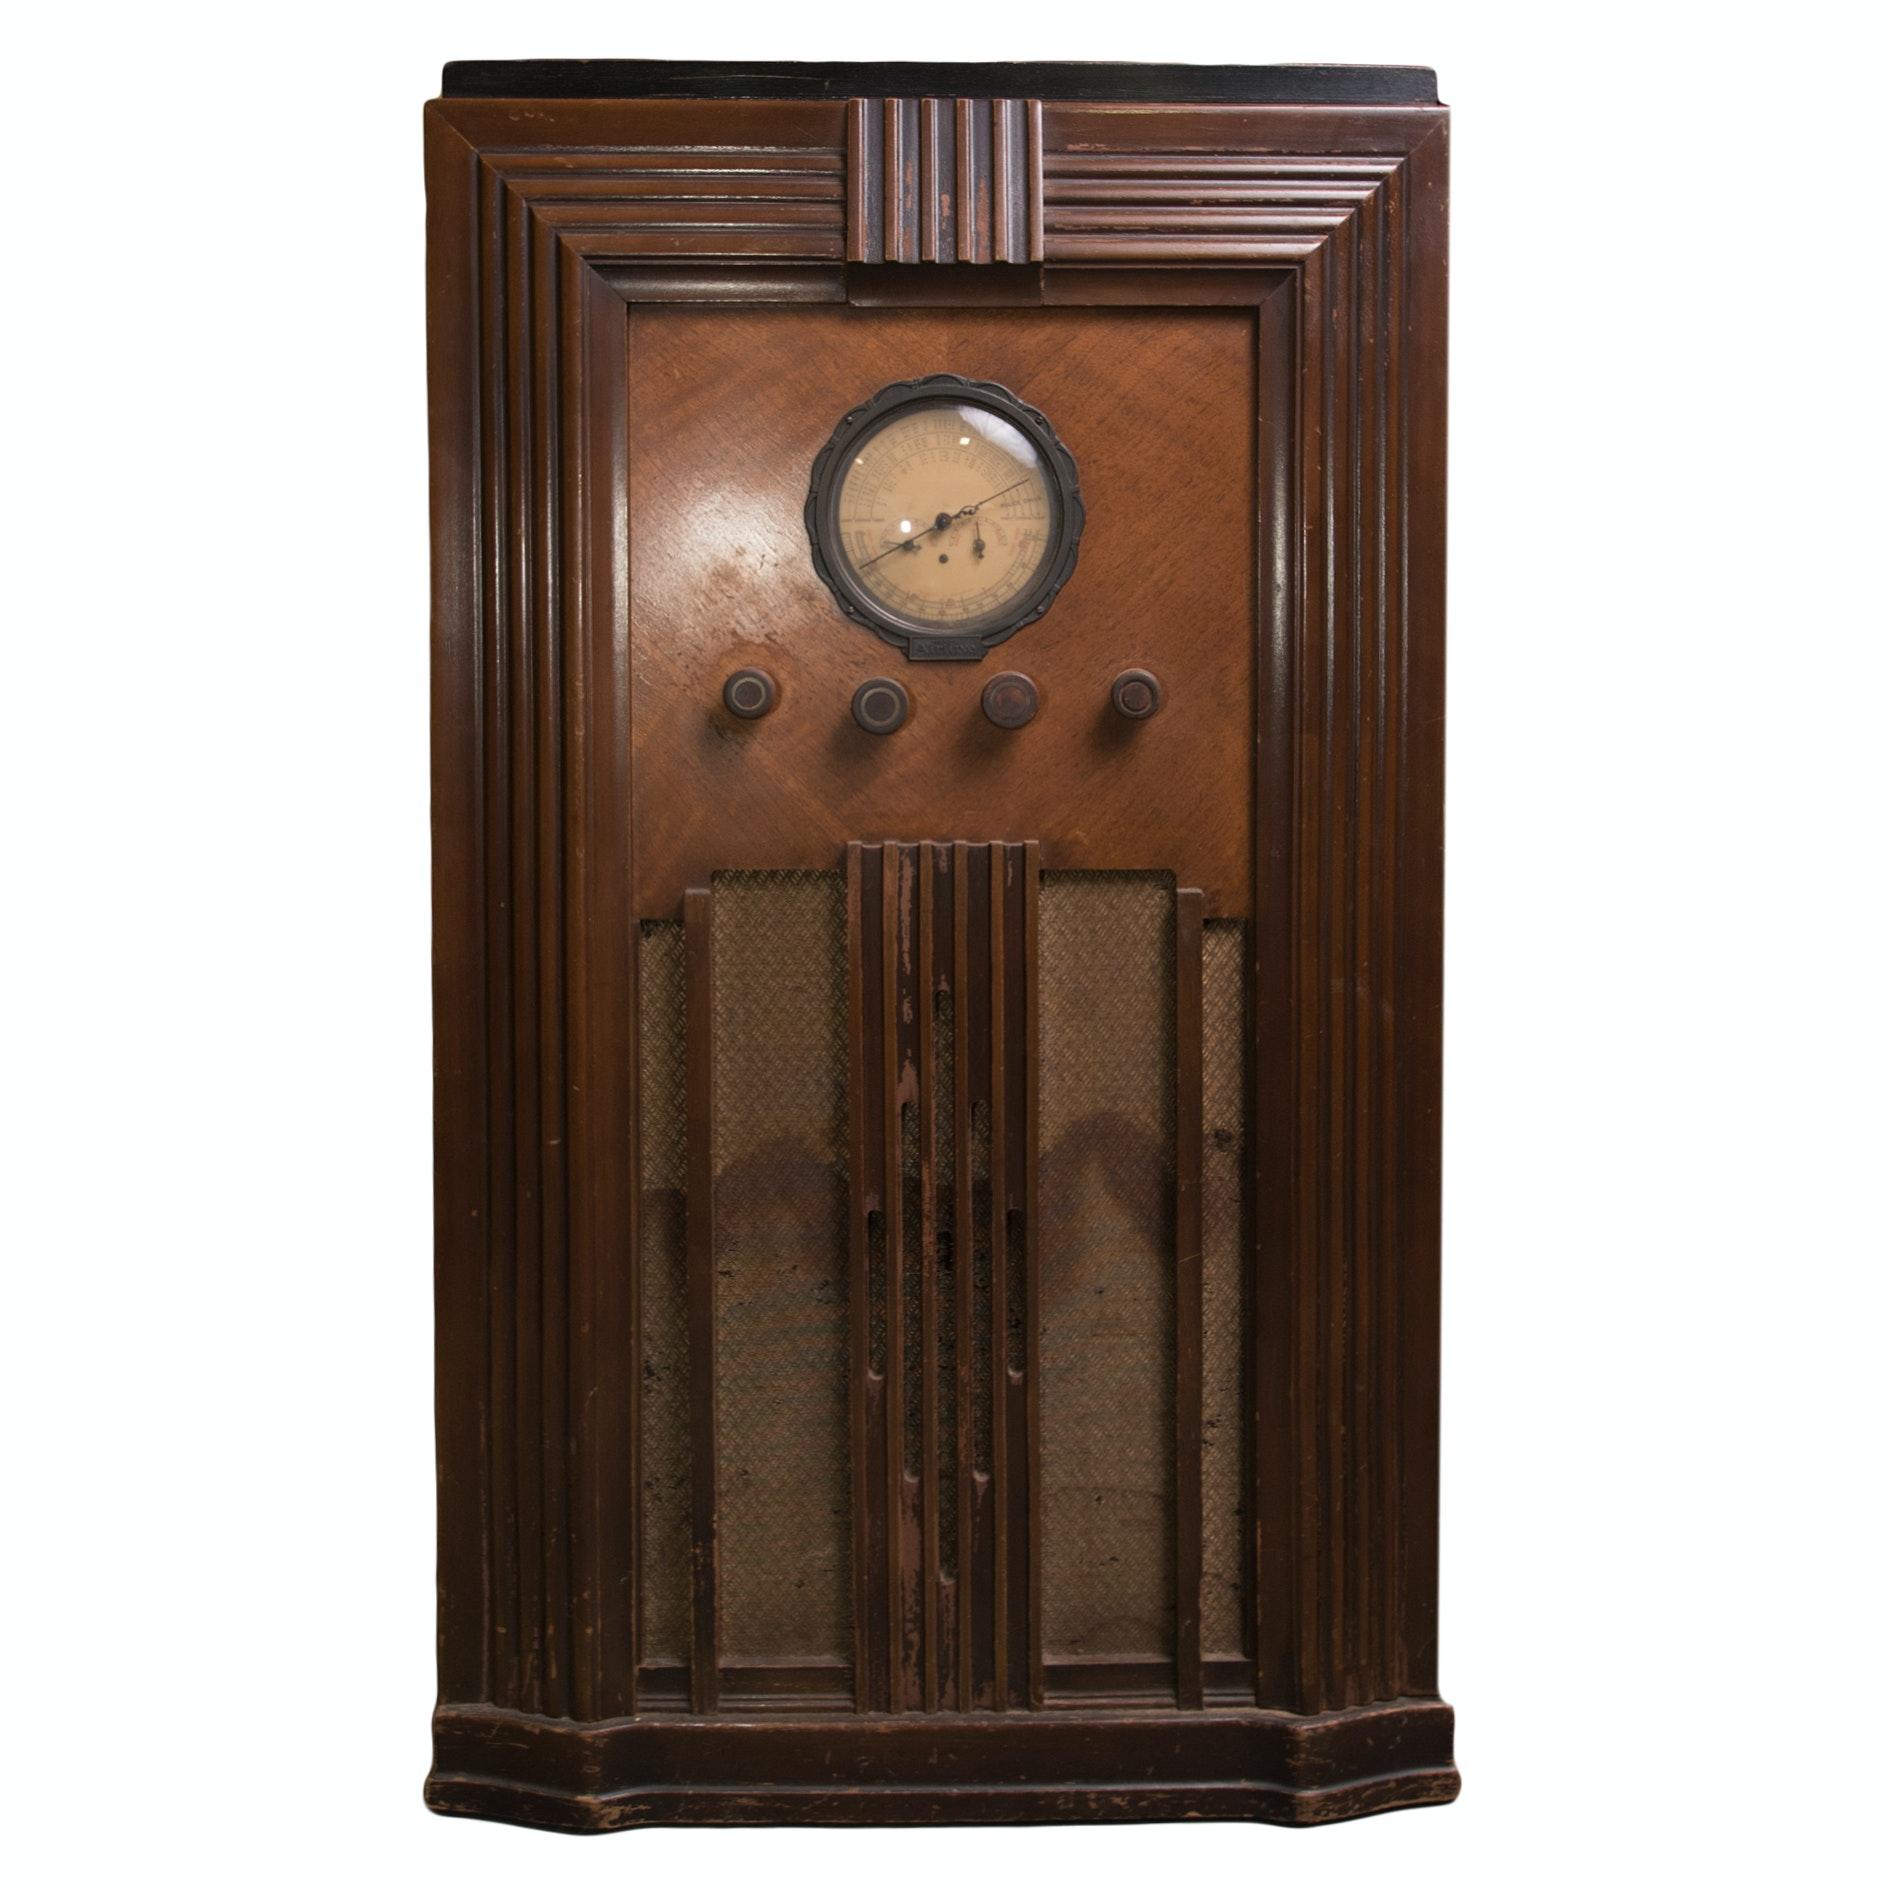 Vintage Ward's Airline Superheterodyne Cabinet Radio